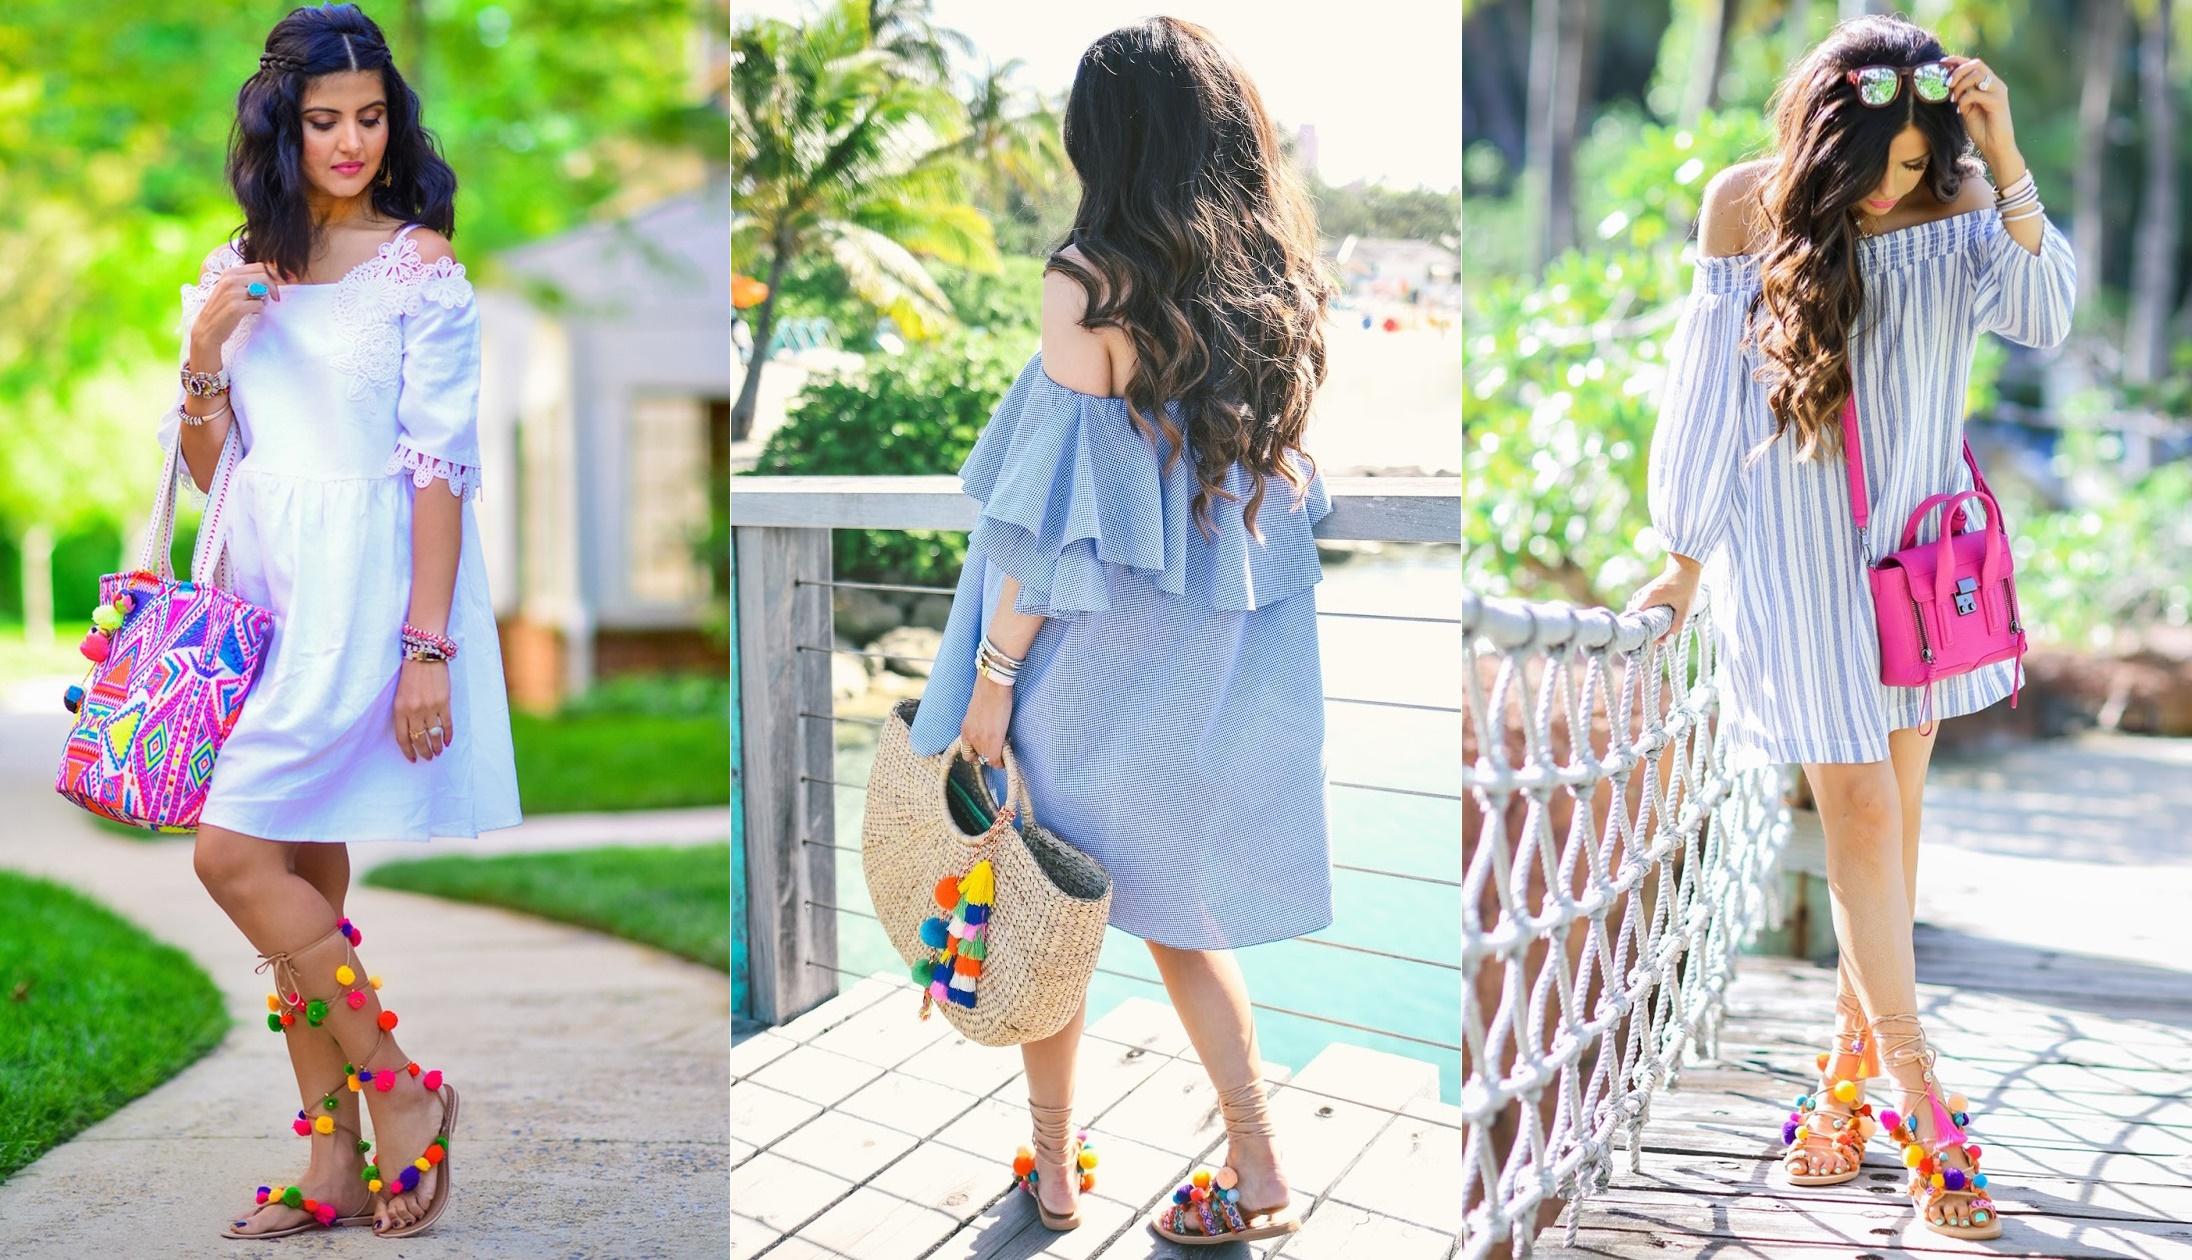 tendencia-moda-sandálias-de-pom-pom